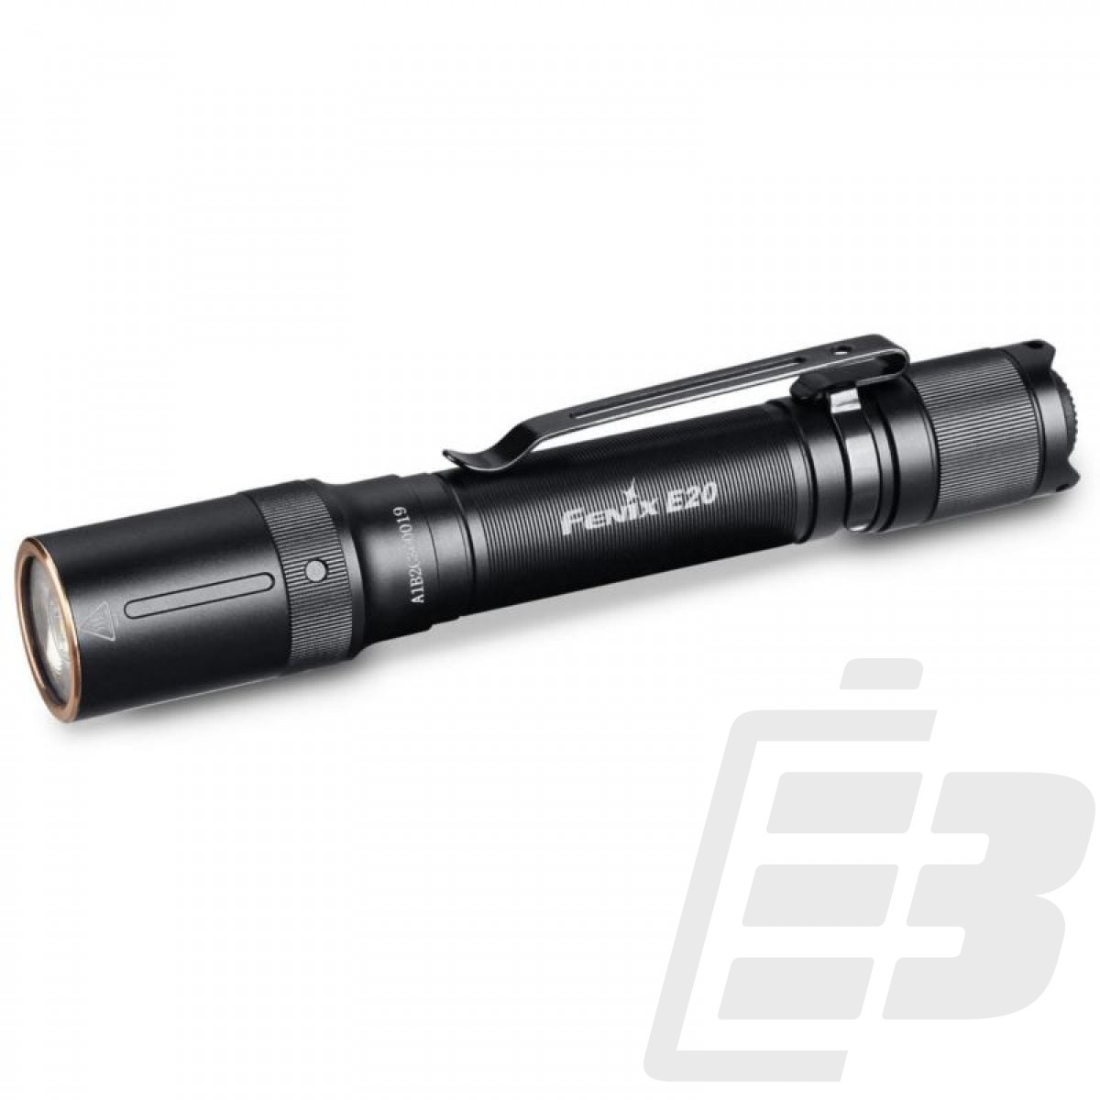 Fenix E20 V2 LED Flashlight, AA batteries 350 lumens